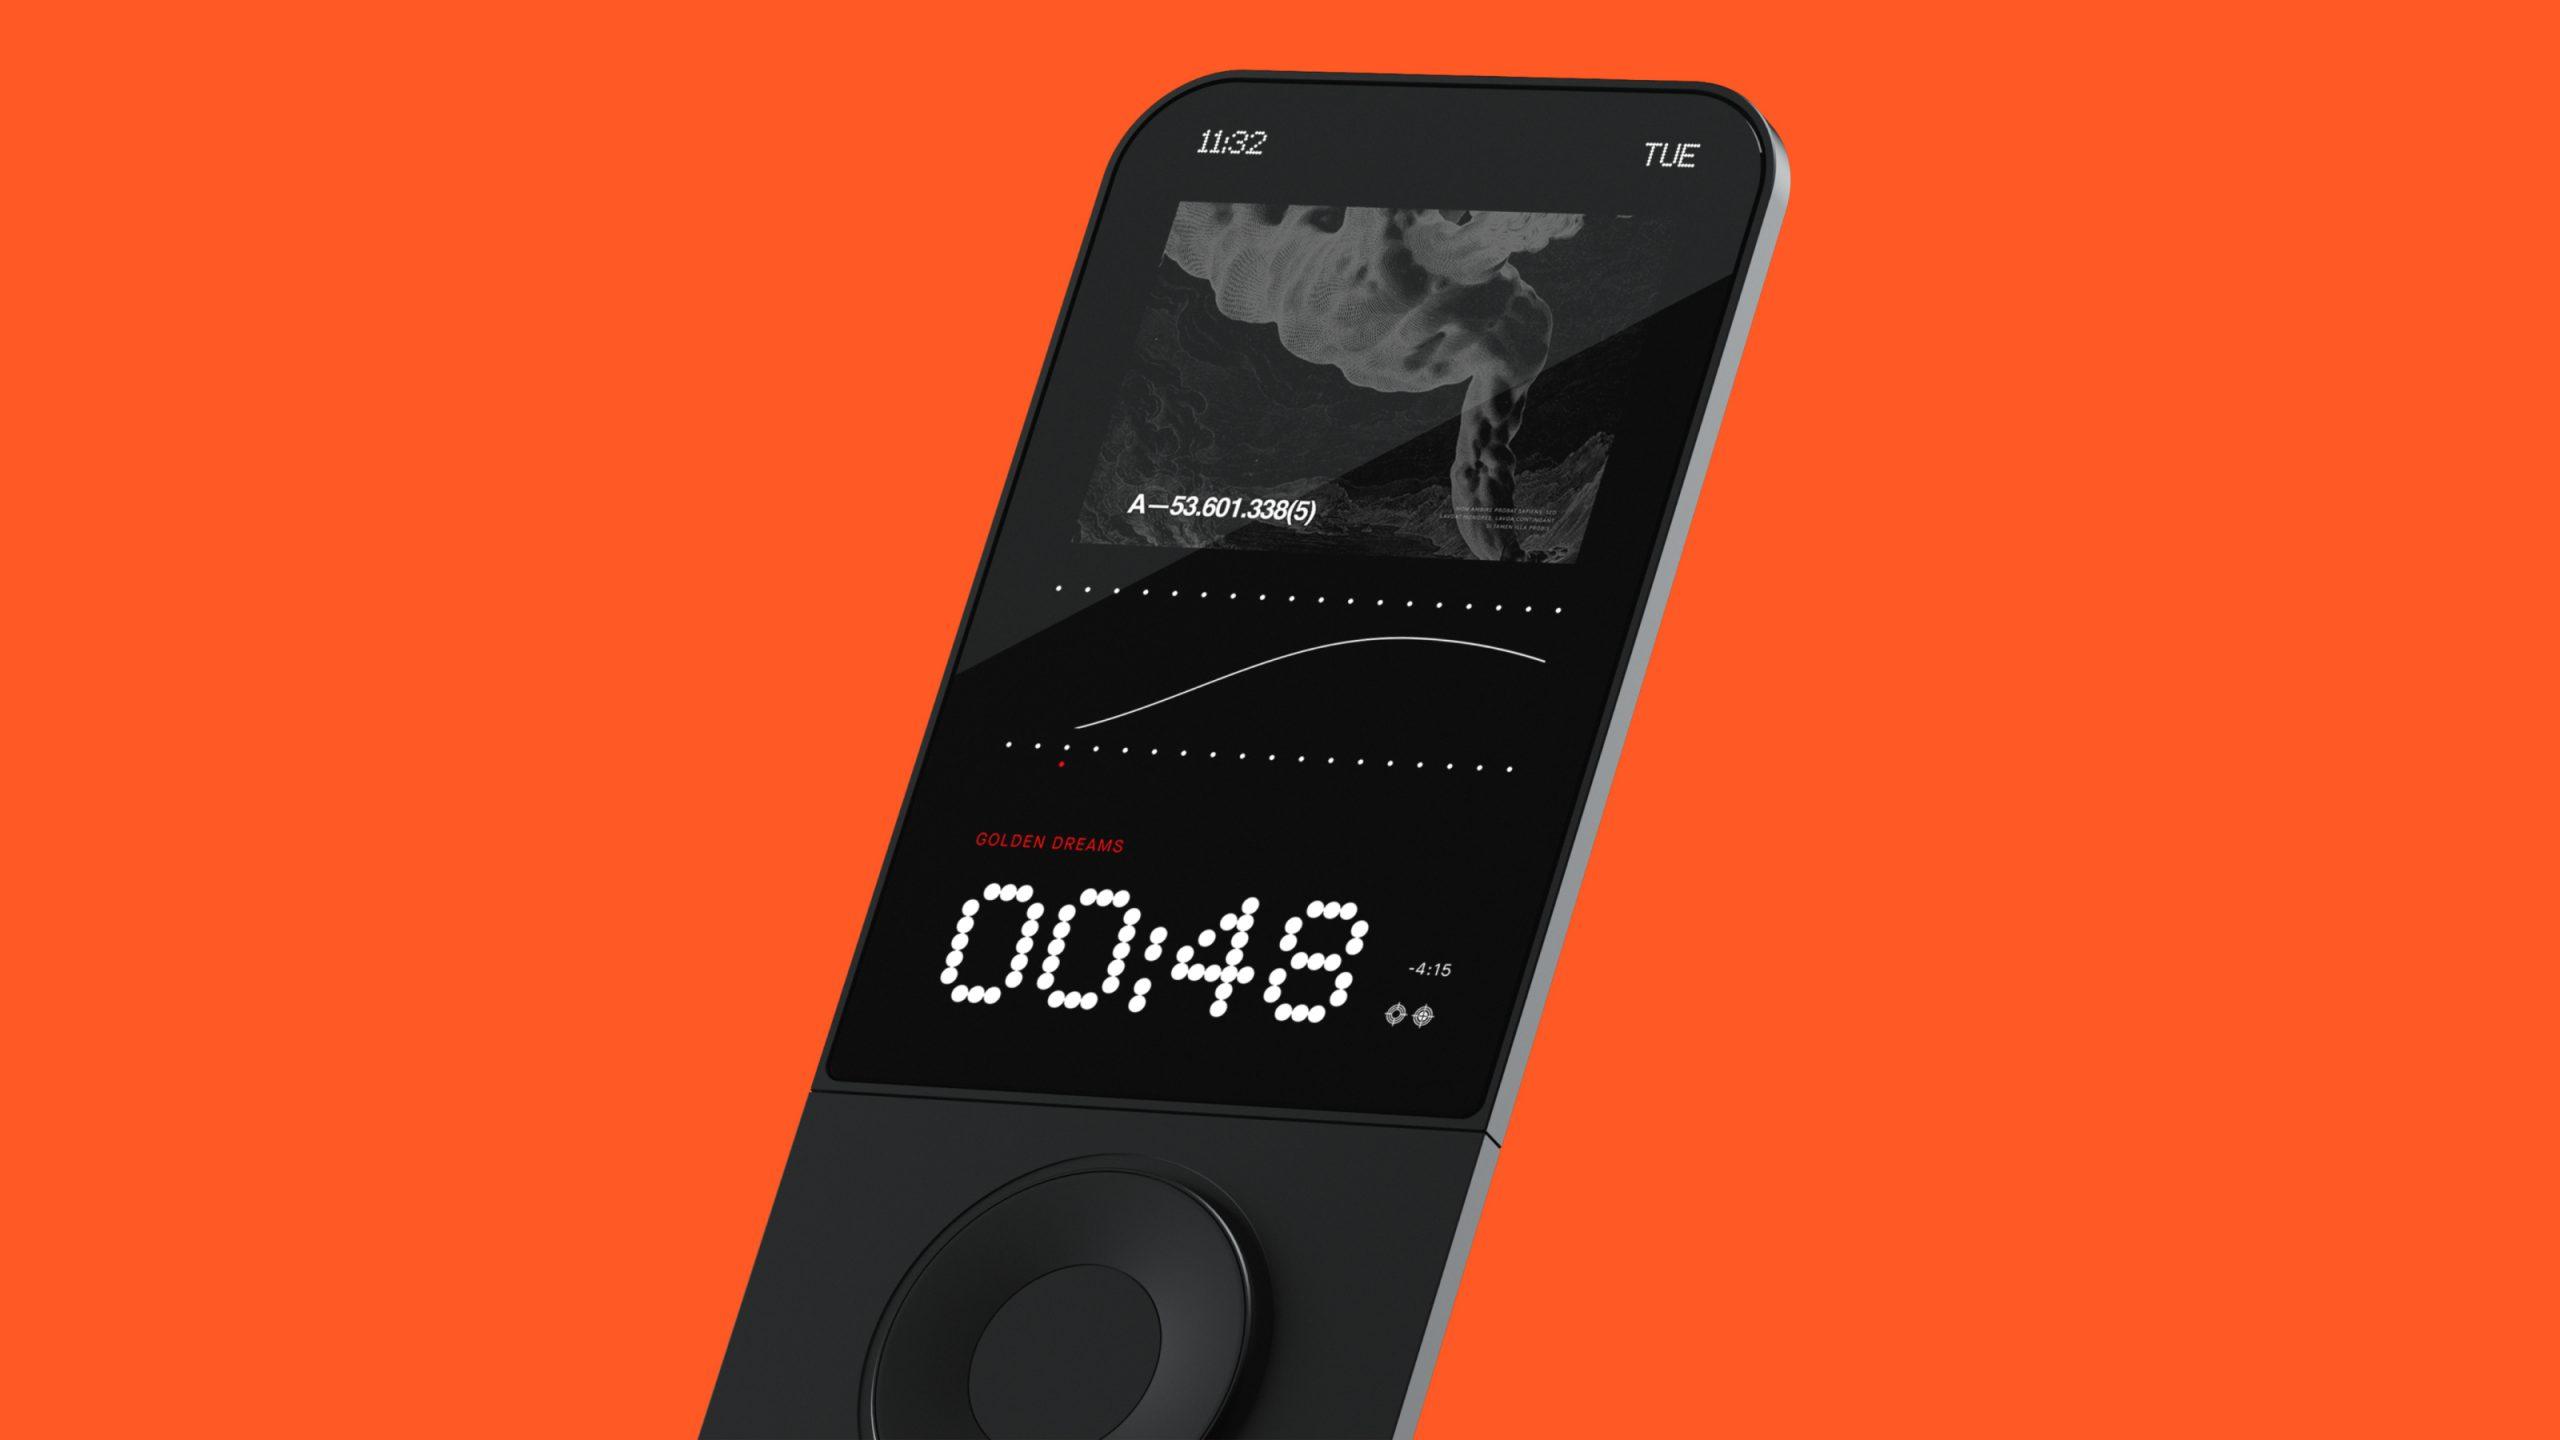 handheld-device-example-004